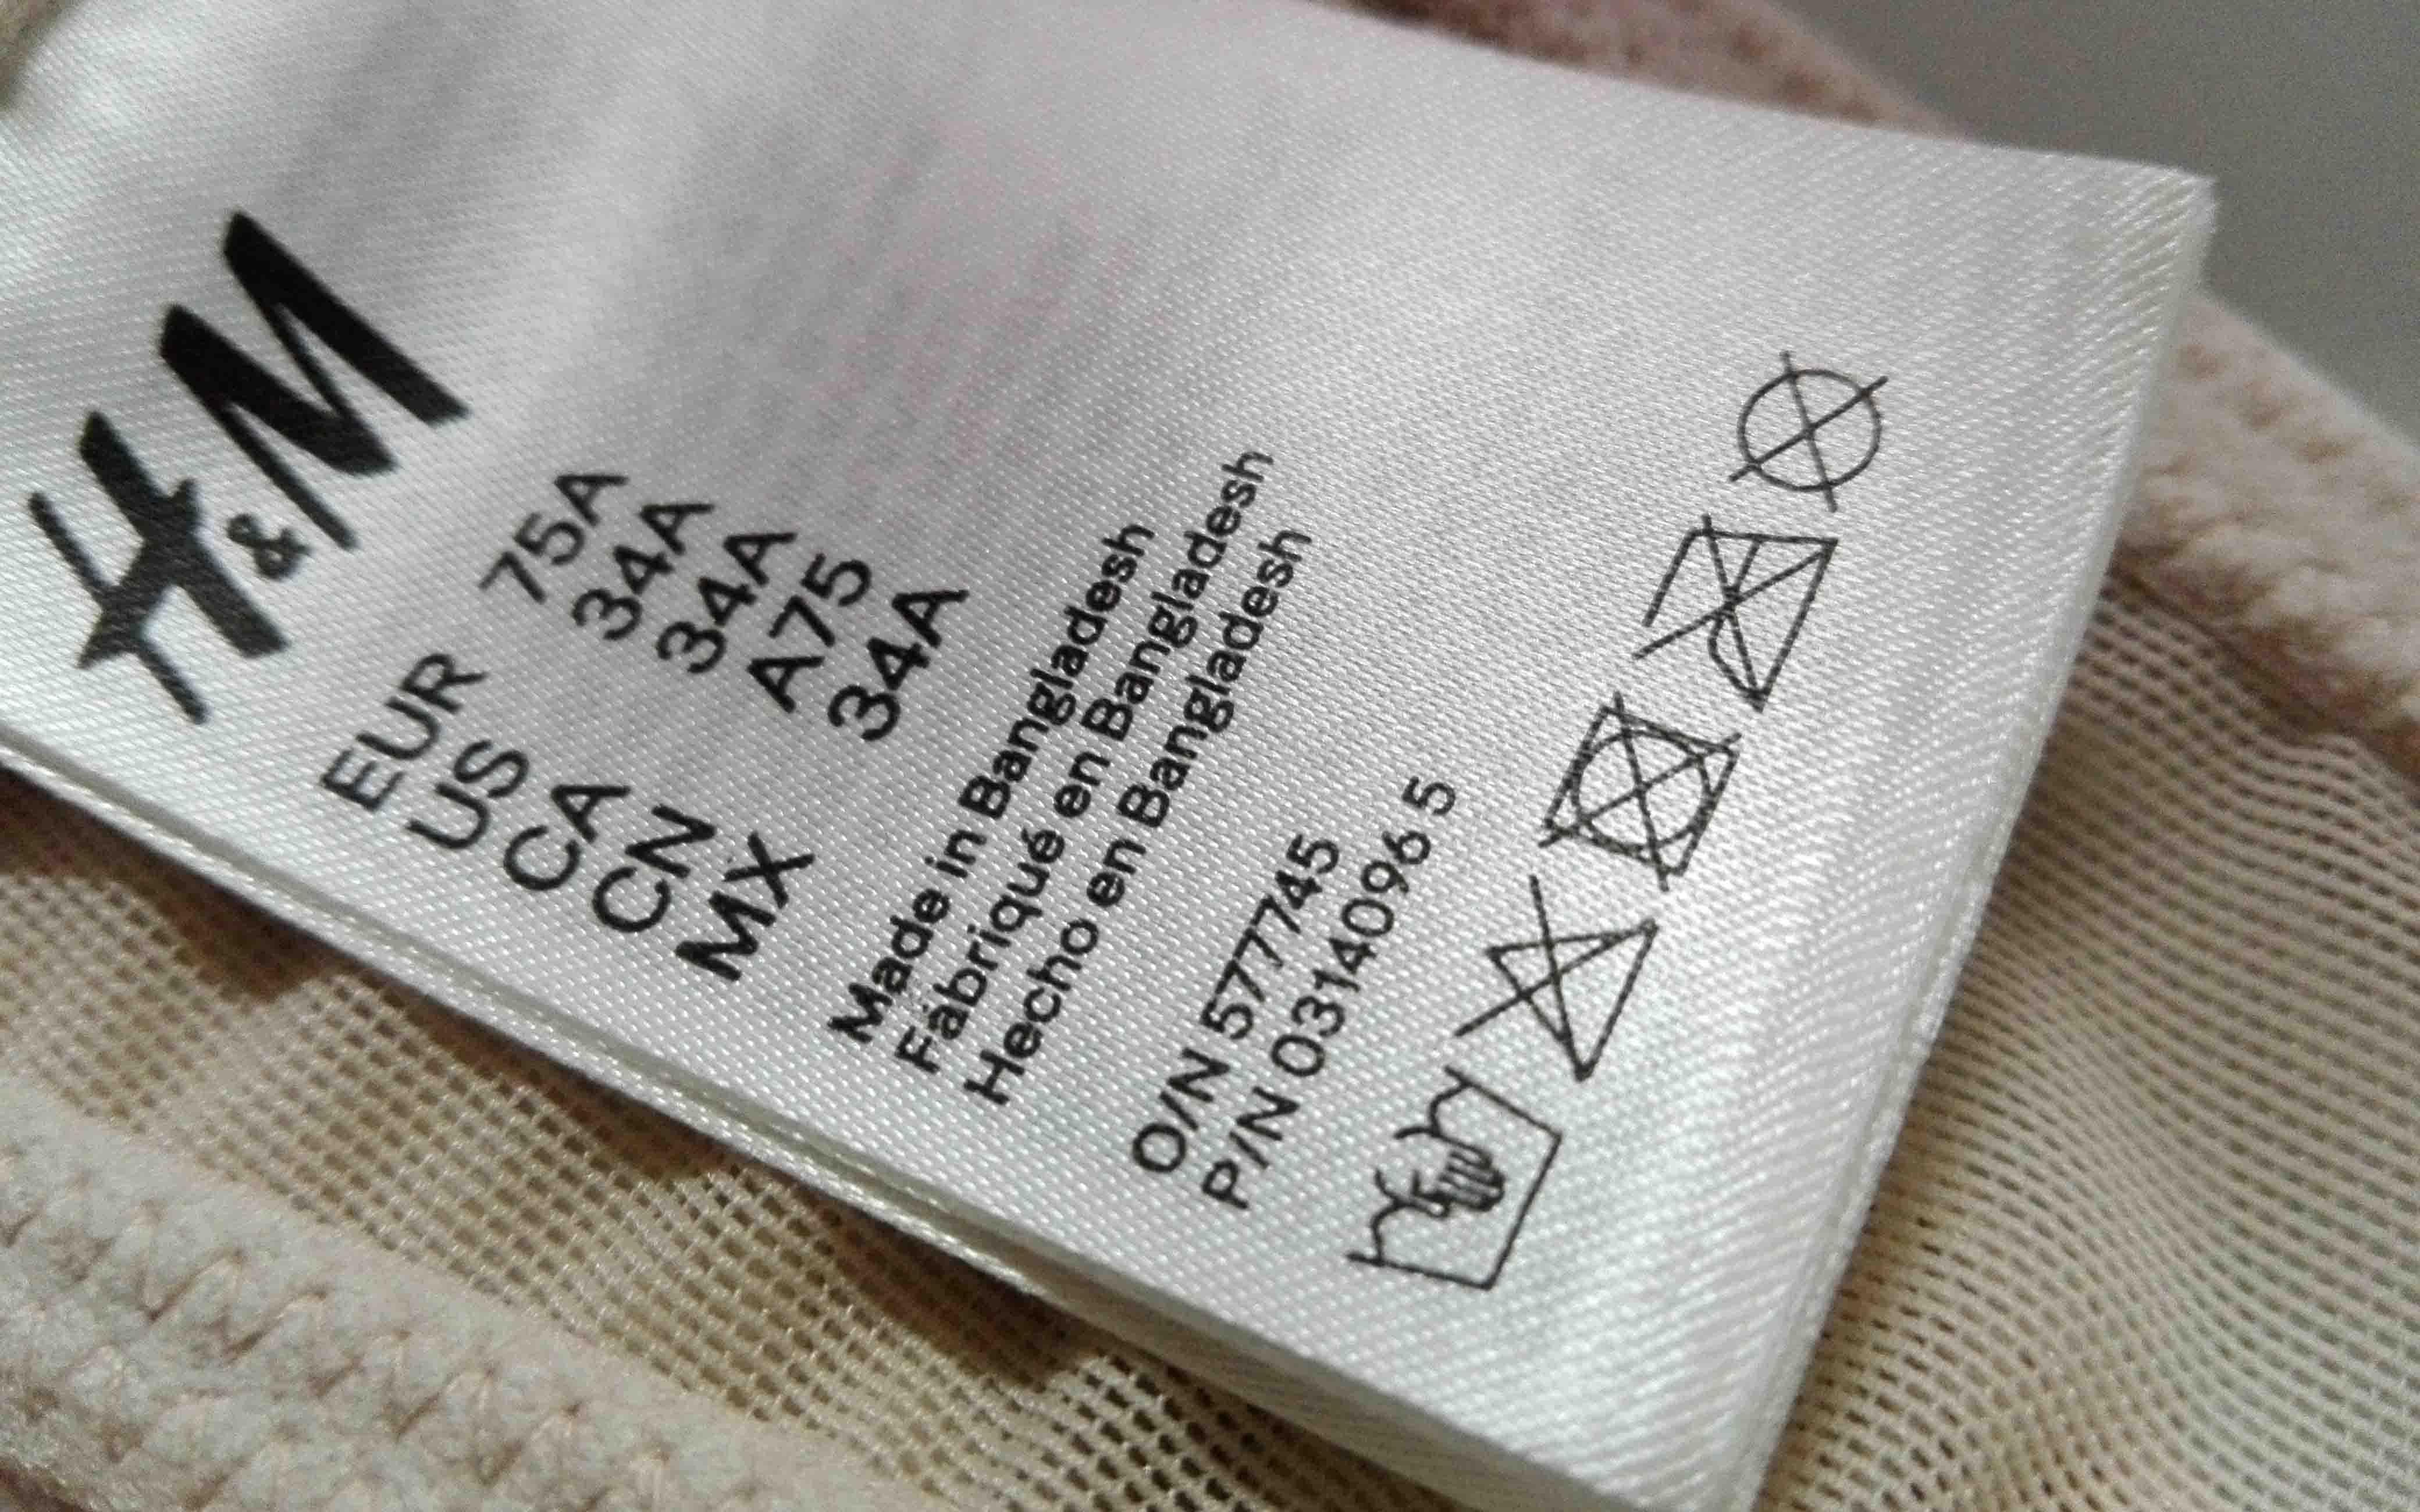 Made in Bangladesh (HM)